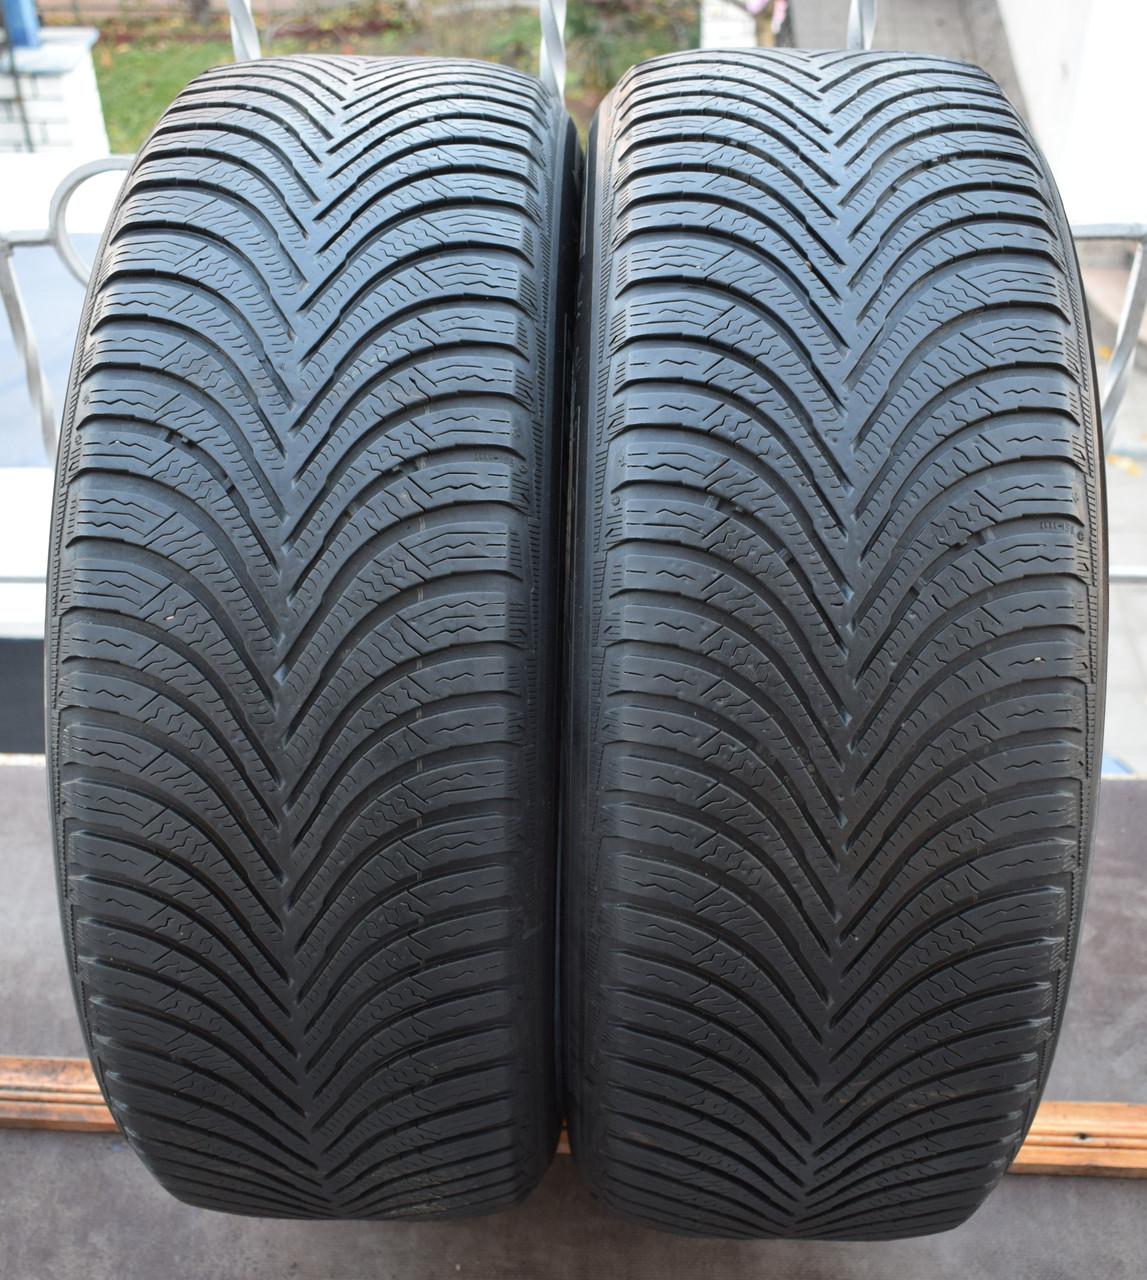 Шины б/у 215/60 R16 Michelin Alpin A5, ЗИМА, 5+ мм, 2016 г., пара